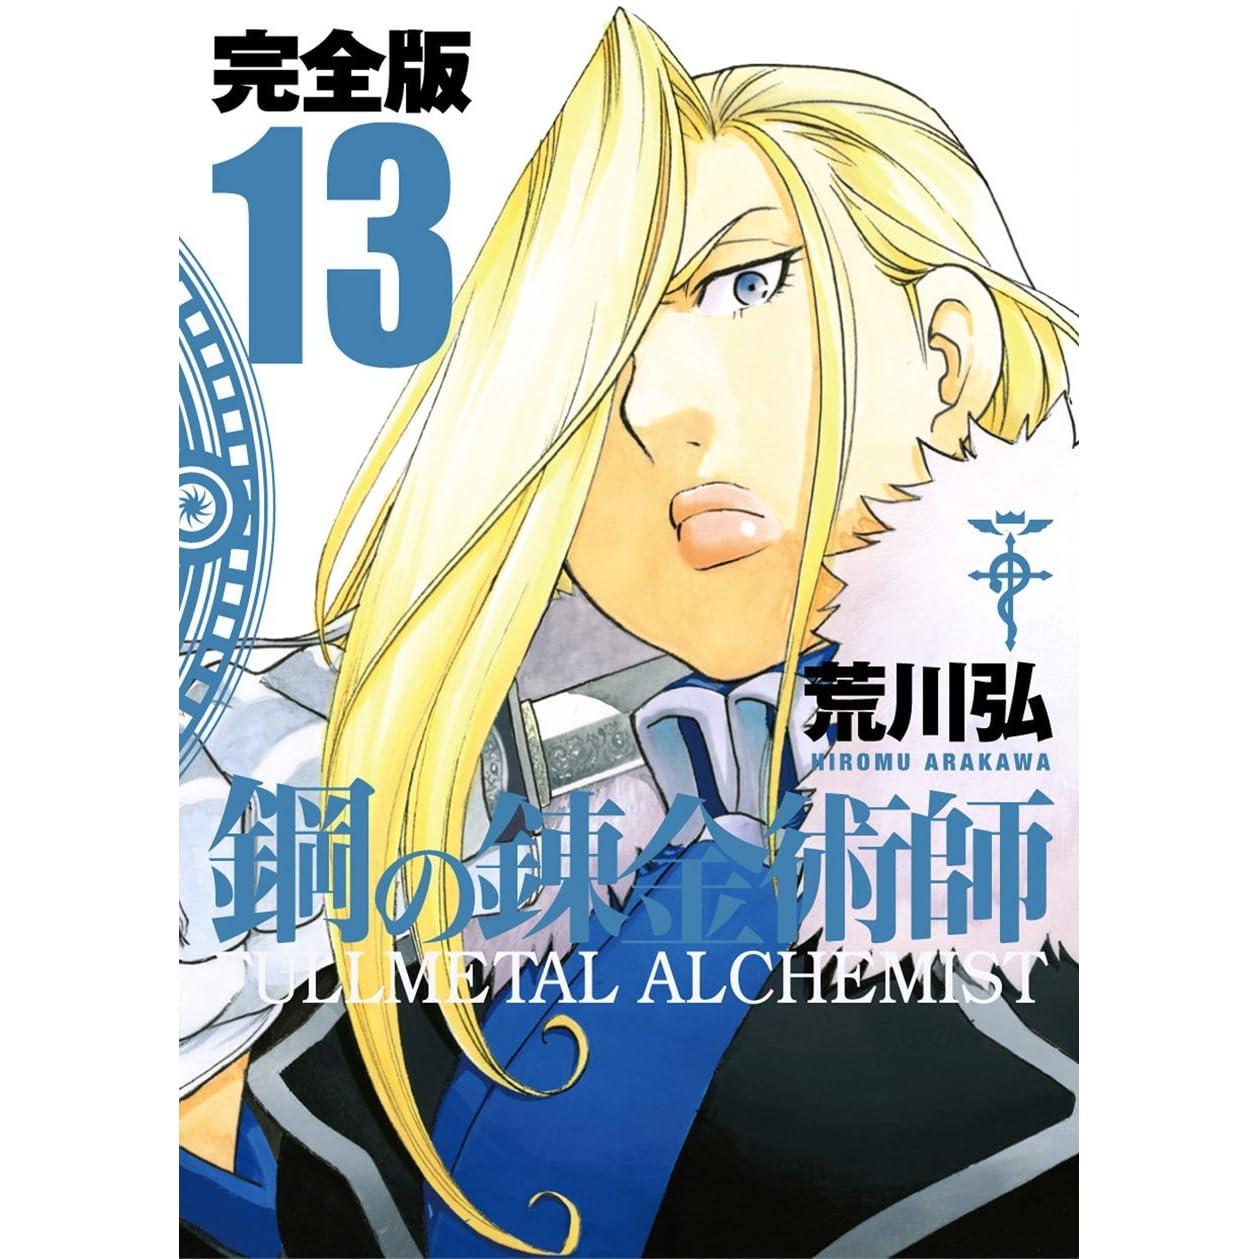 Fullmetal Alchemist Kanzenban vol.13 JAPAN Hiromu Arakawa manga